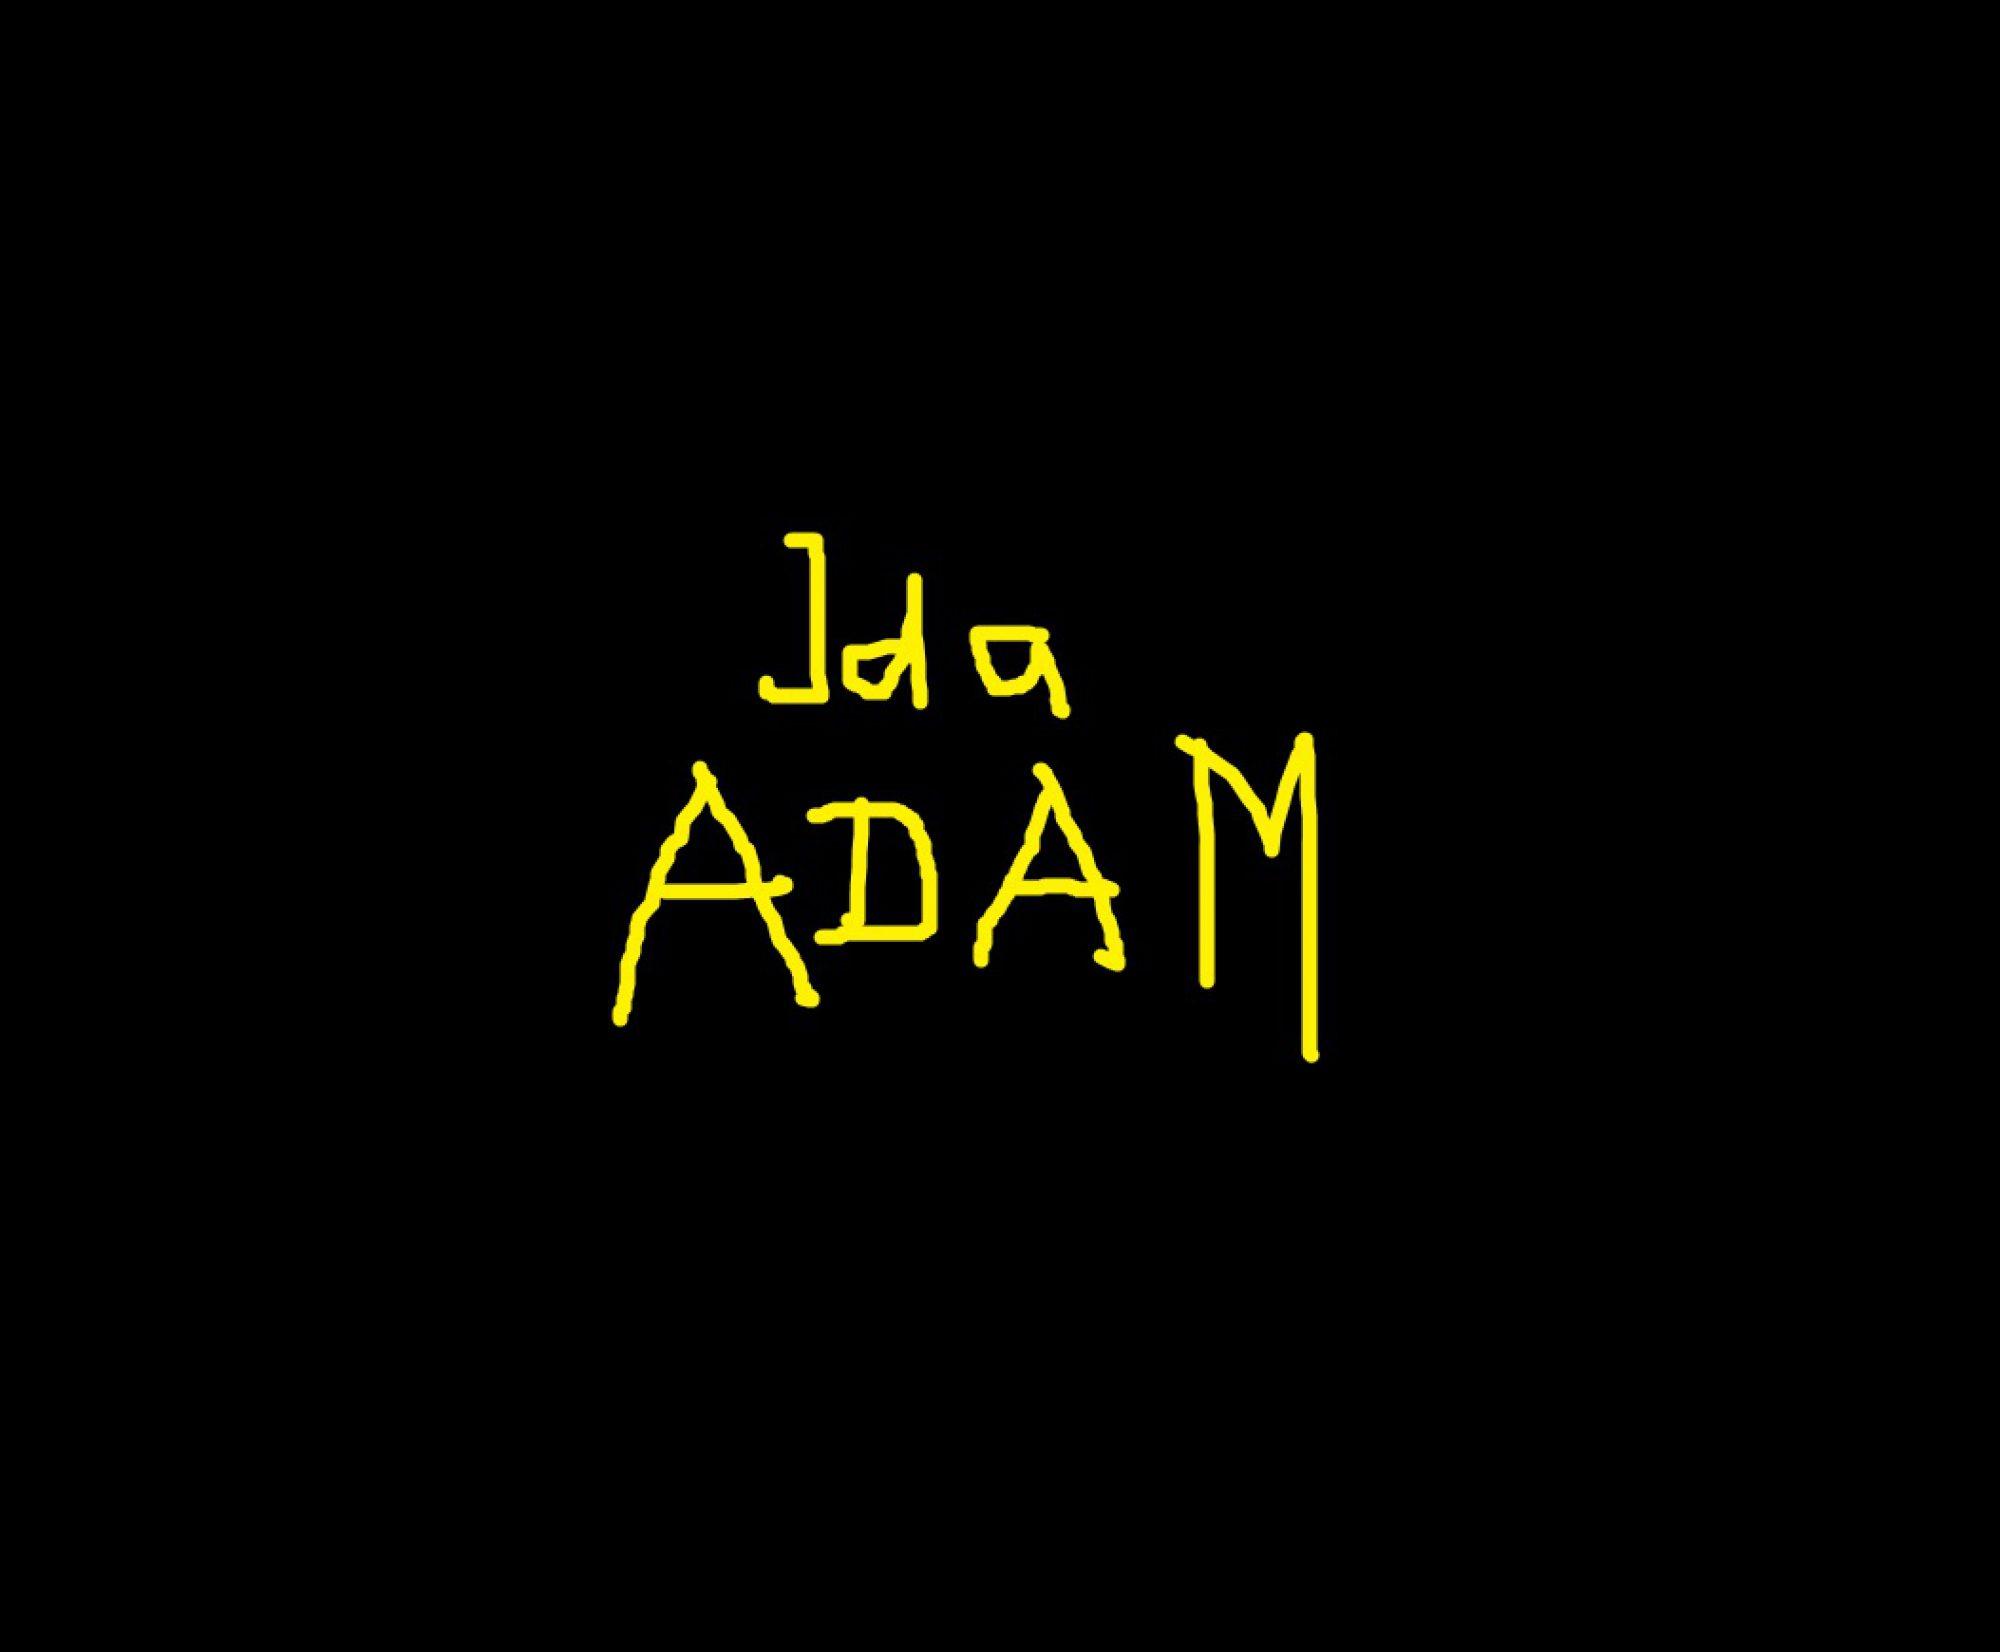 Ida Adam